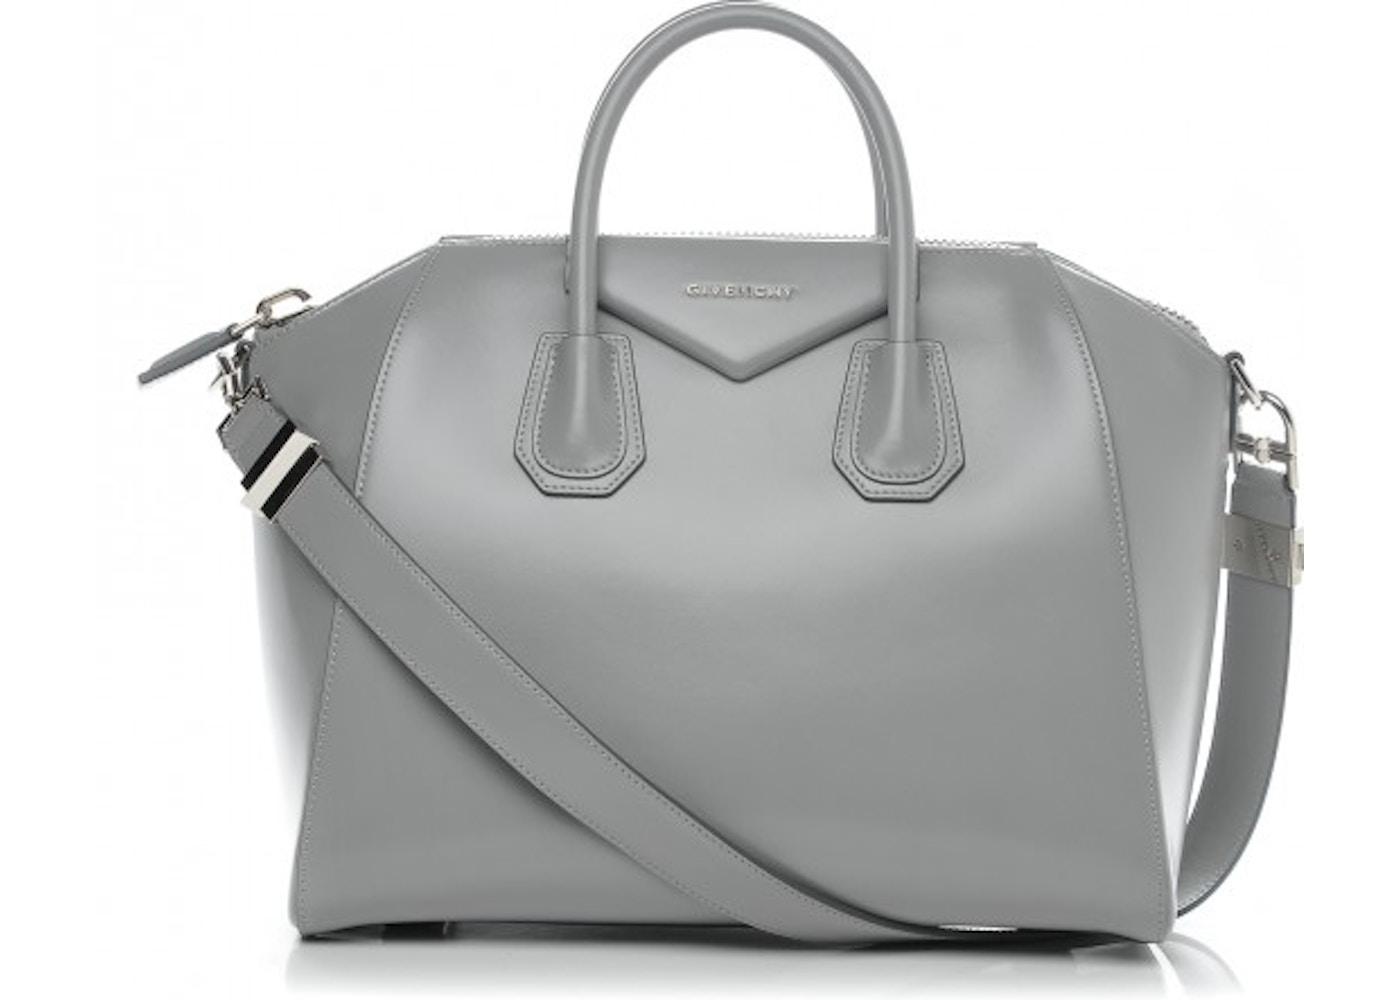 7eb11b1829 Givenchy Antigona Tote Shiny Lord Calfskin Medium Pearl Grey